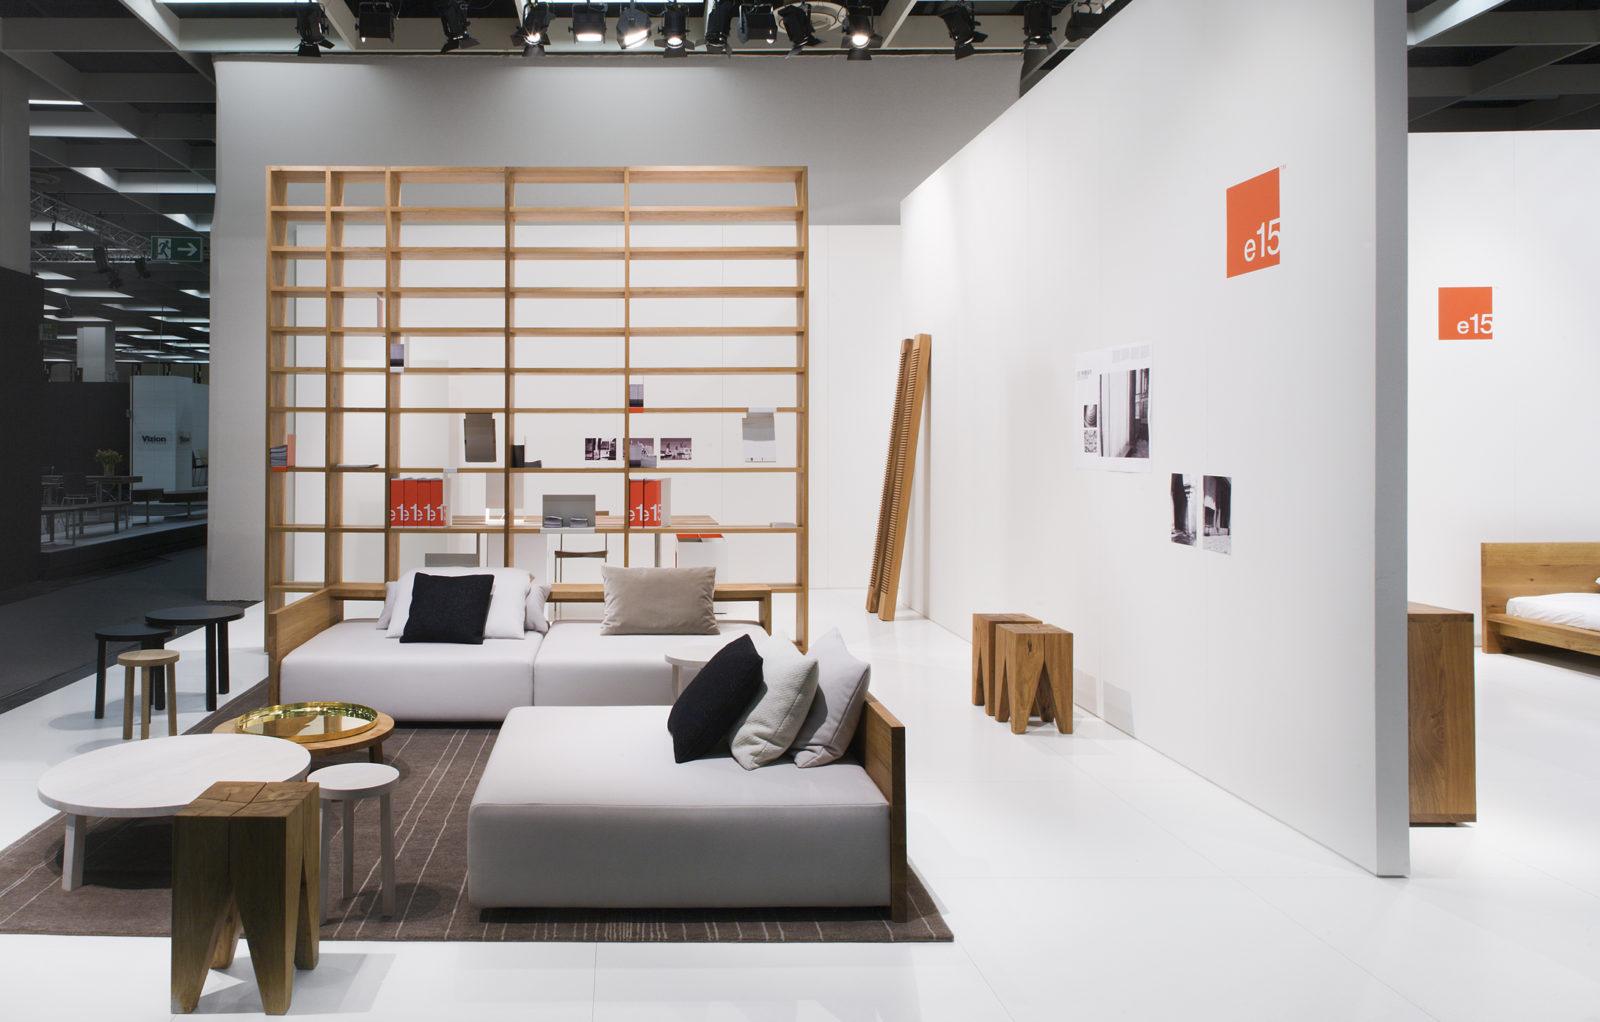 e15 imm cologne 2007 cologne philipp mainzer. Black Bedroom Furniture Sets. Home Design Ideas